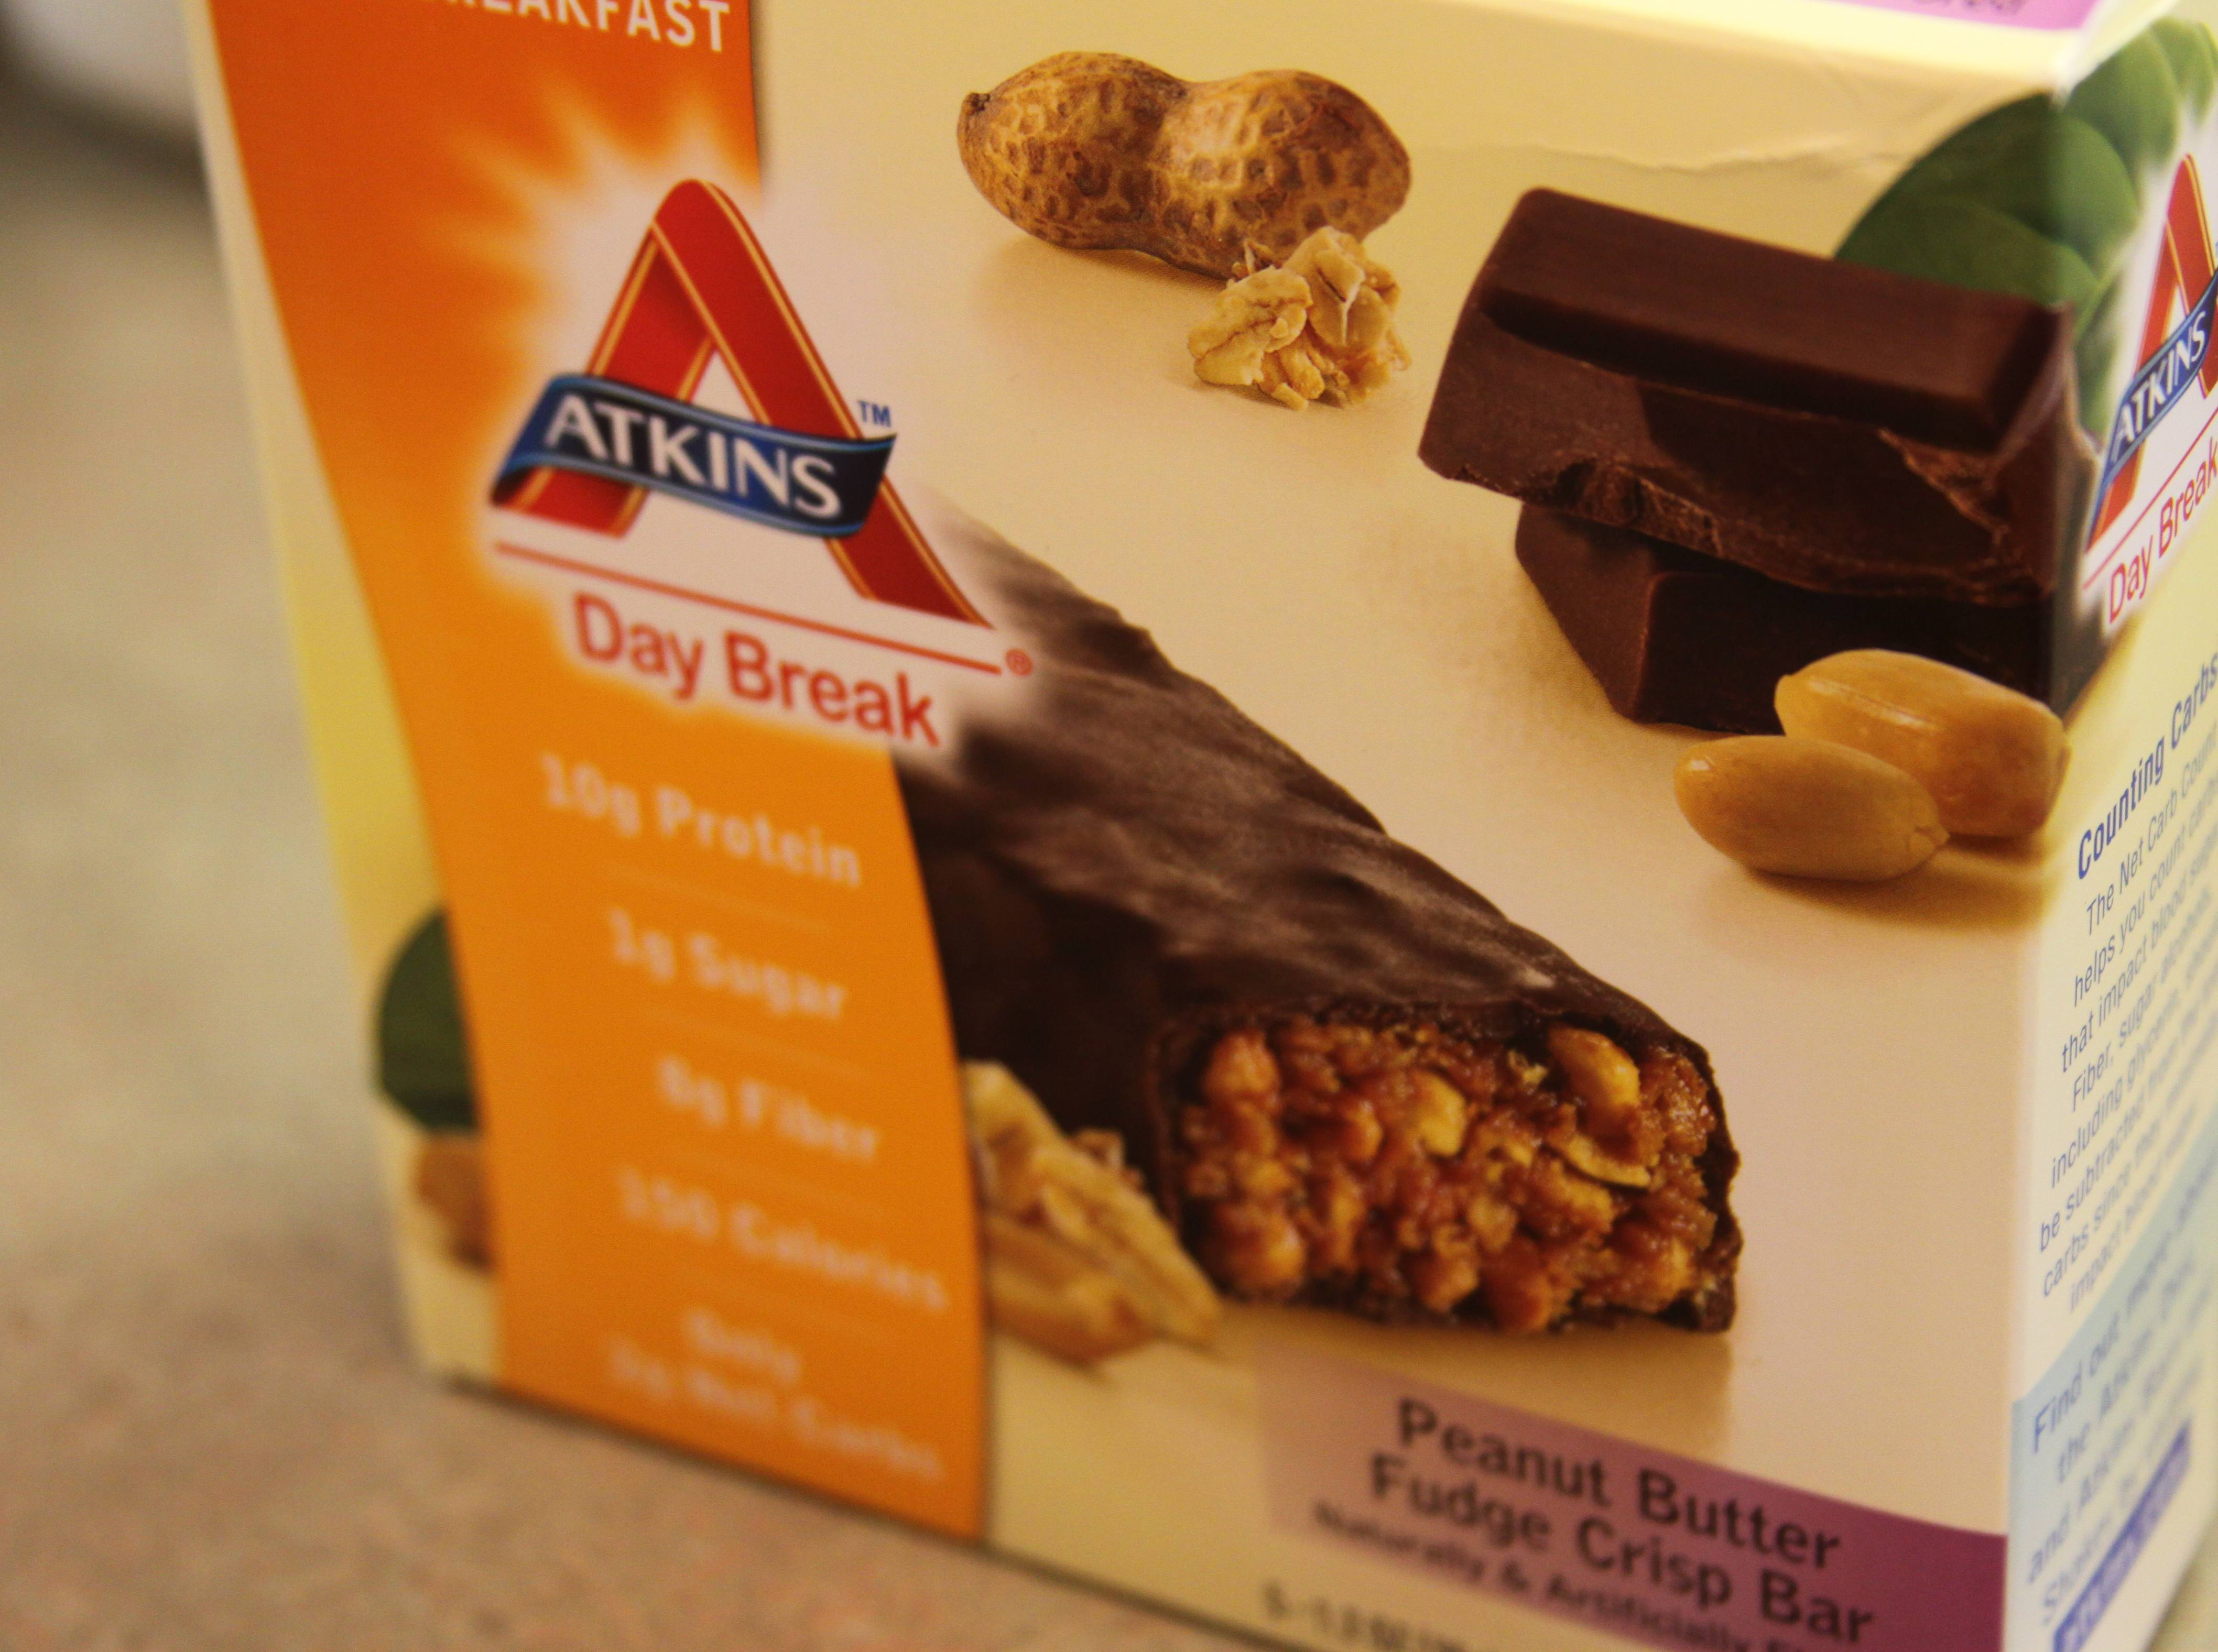 Atkins food for Atkins cuisine bread